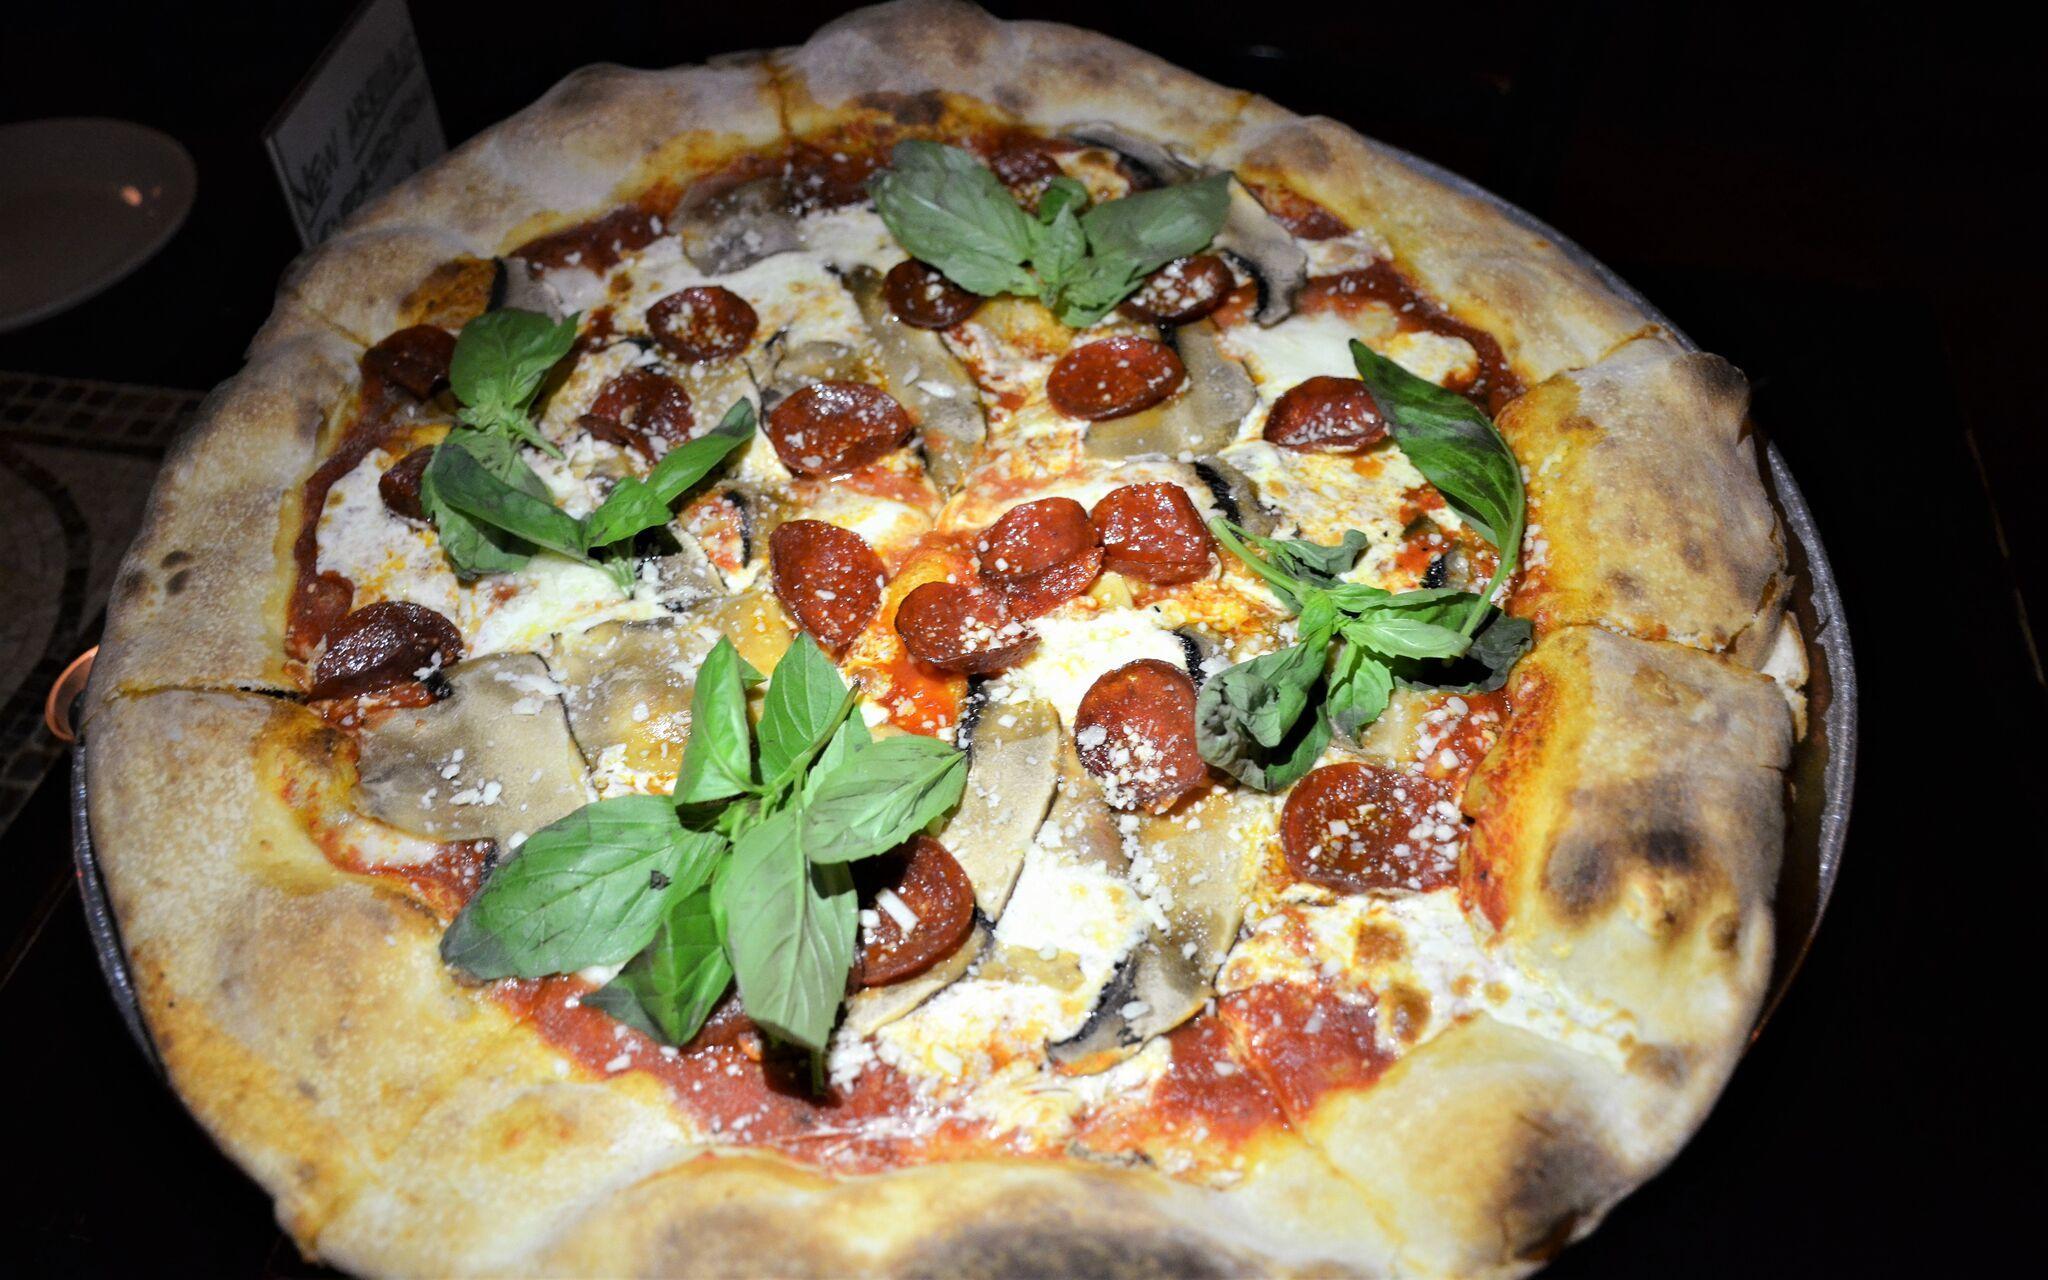 Mushroom and pepperoni at Giuseppina